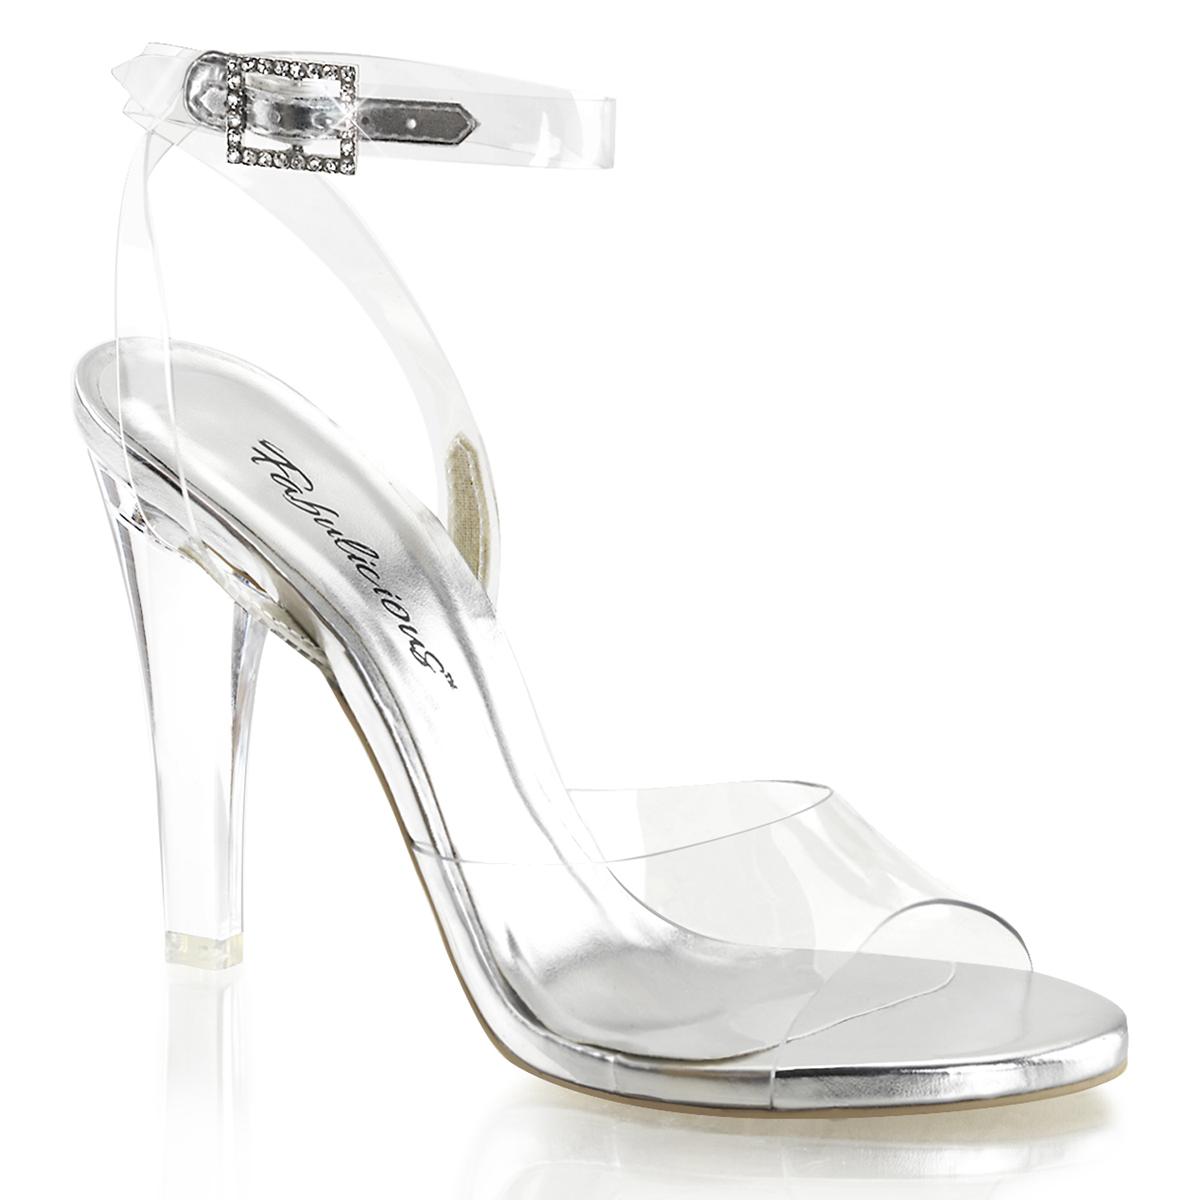 76ec23f9ab7 Sandal CLEARLY-406 - Clear